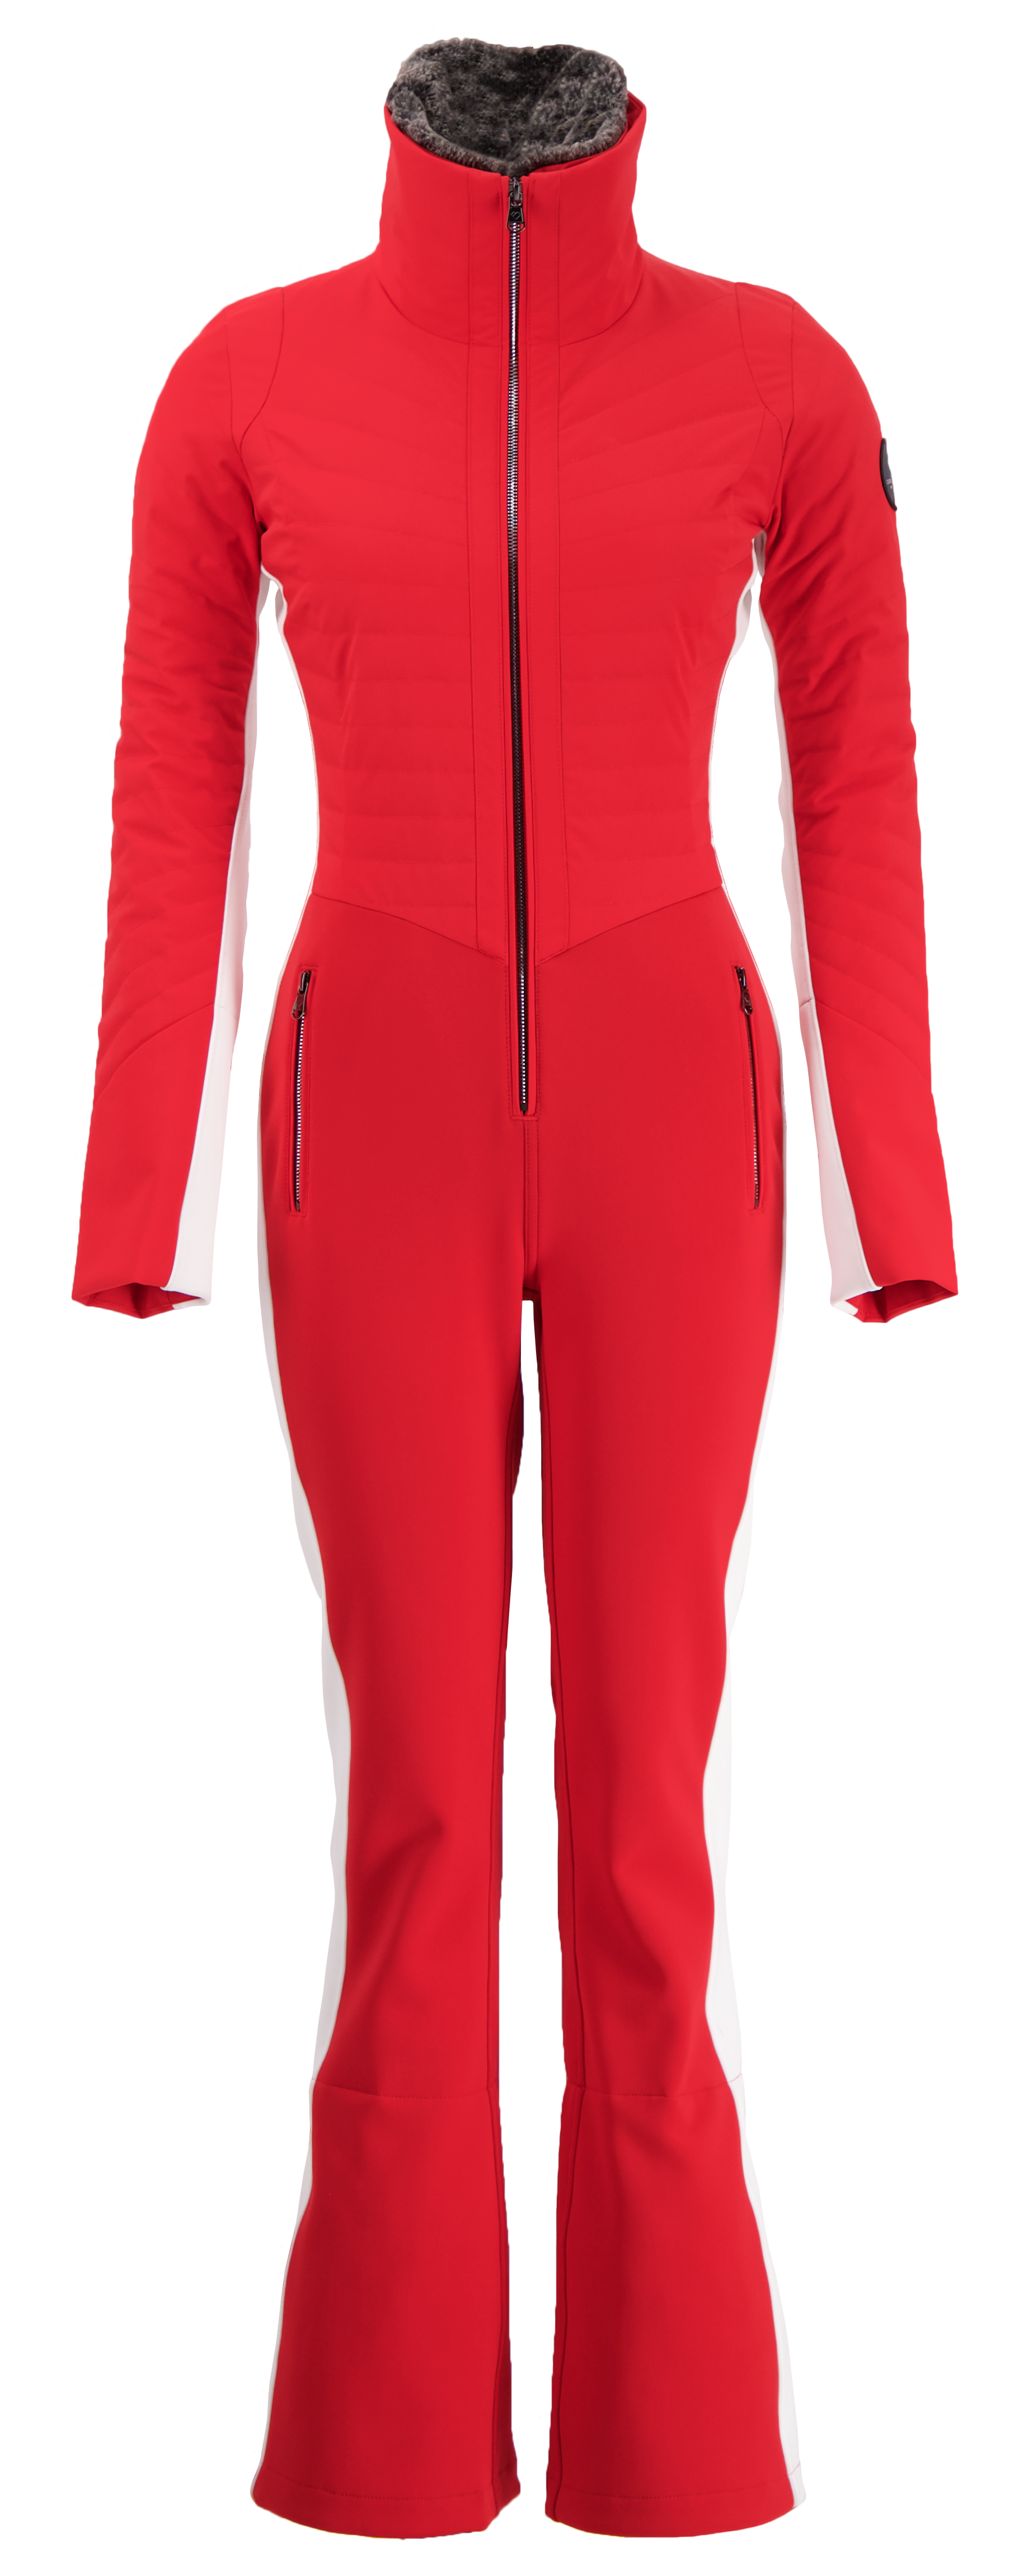 2021 Nordica Santa Ana 104 Free Women's All-Mountain Wide Ski thumb